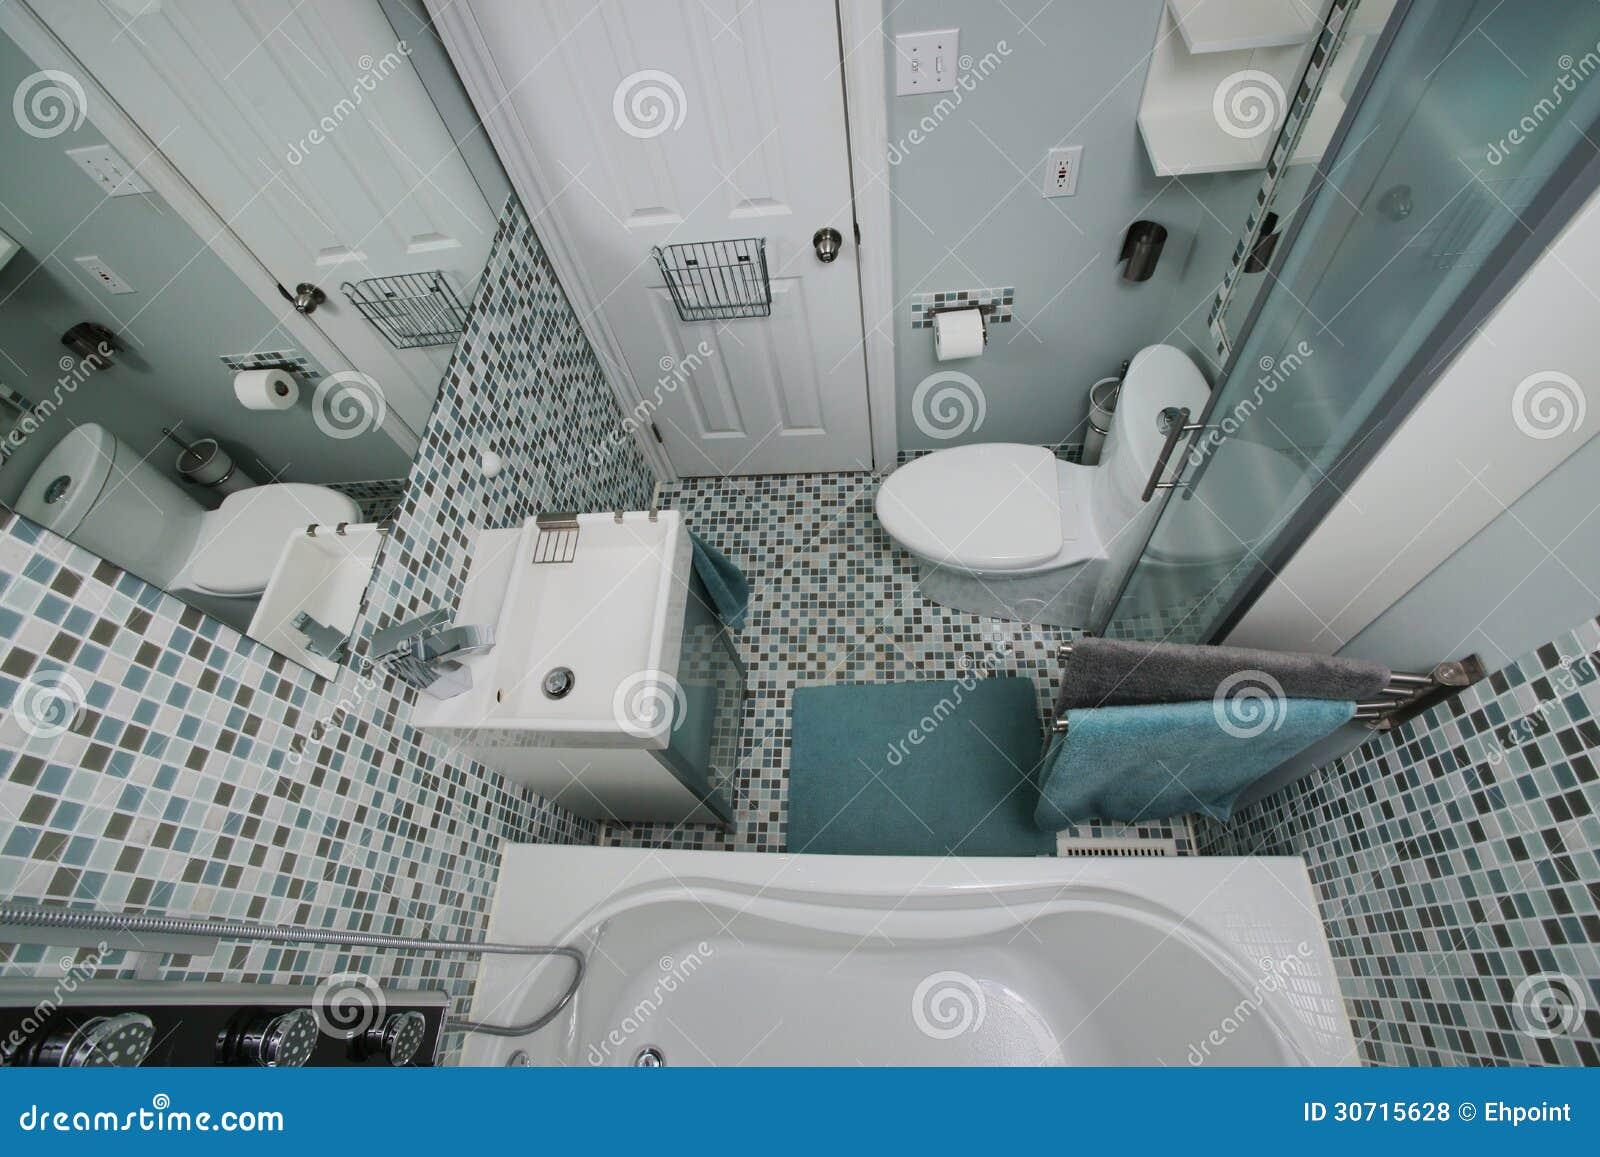 Banheiro Moderno Pequeno Fotos de Stock Royalty Free  Imagem 30715628 -> Banheiro Pequeno E Moderno